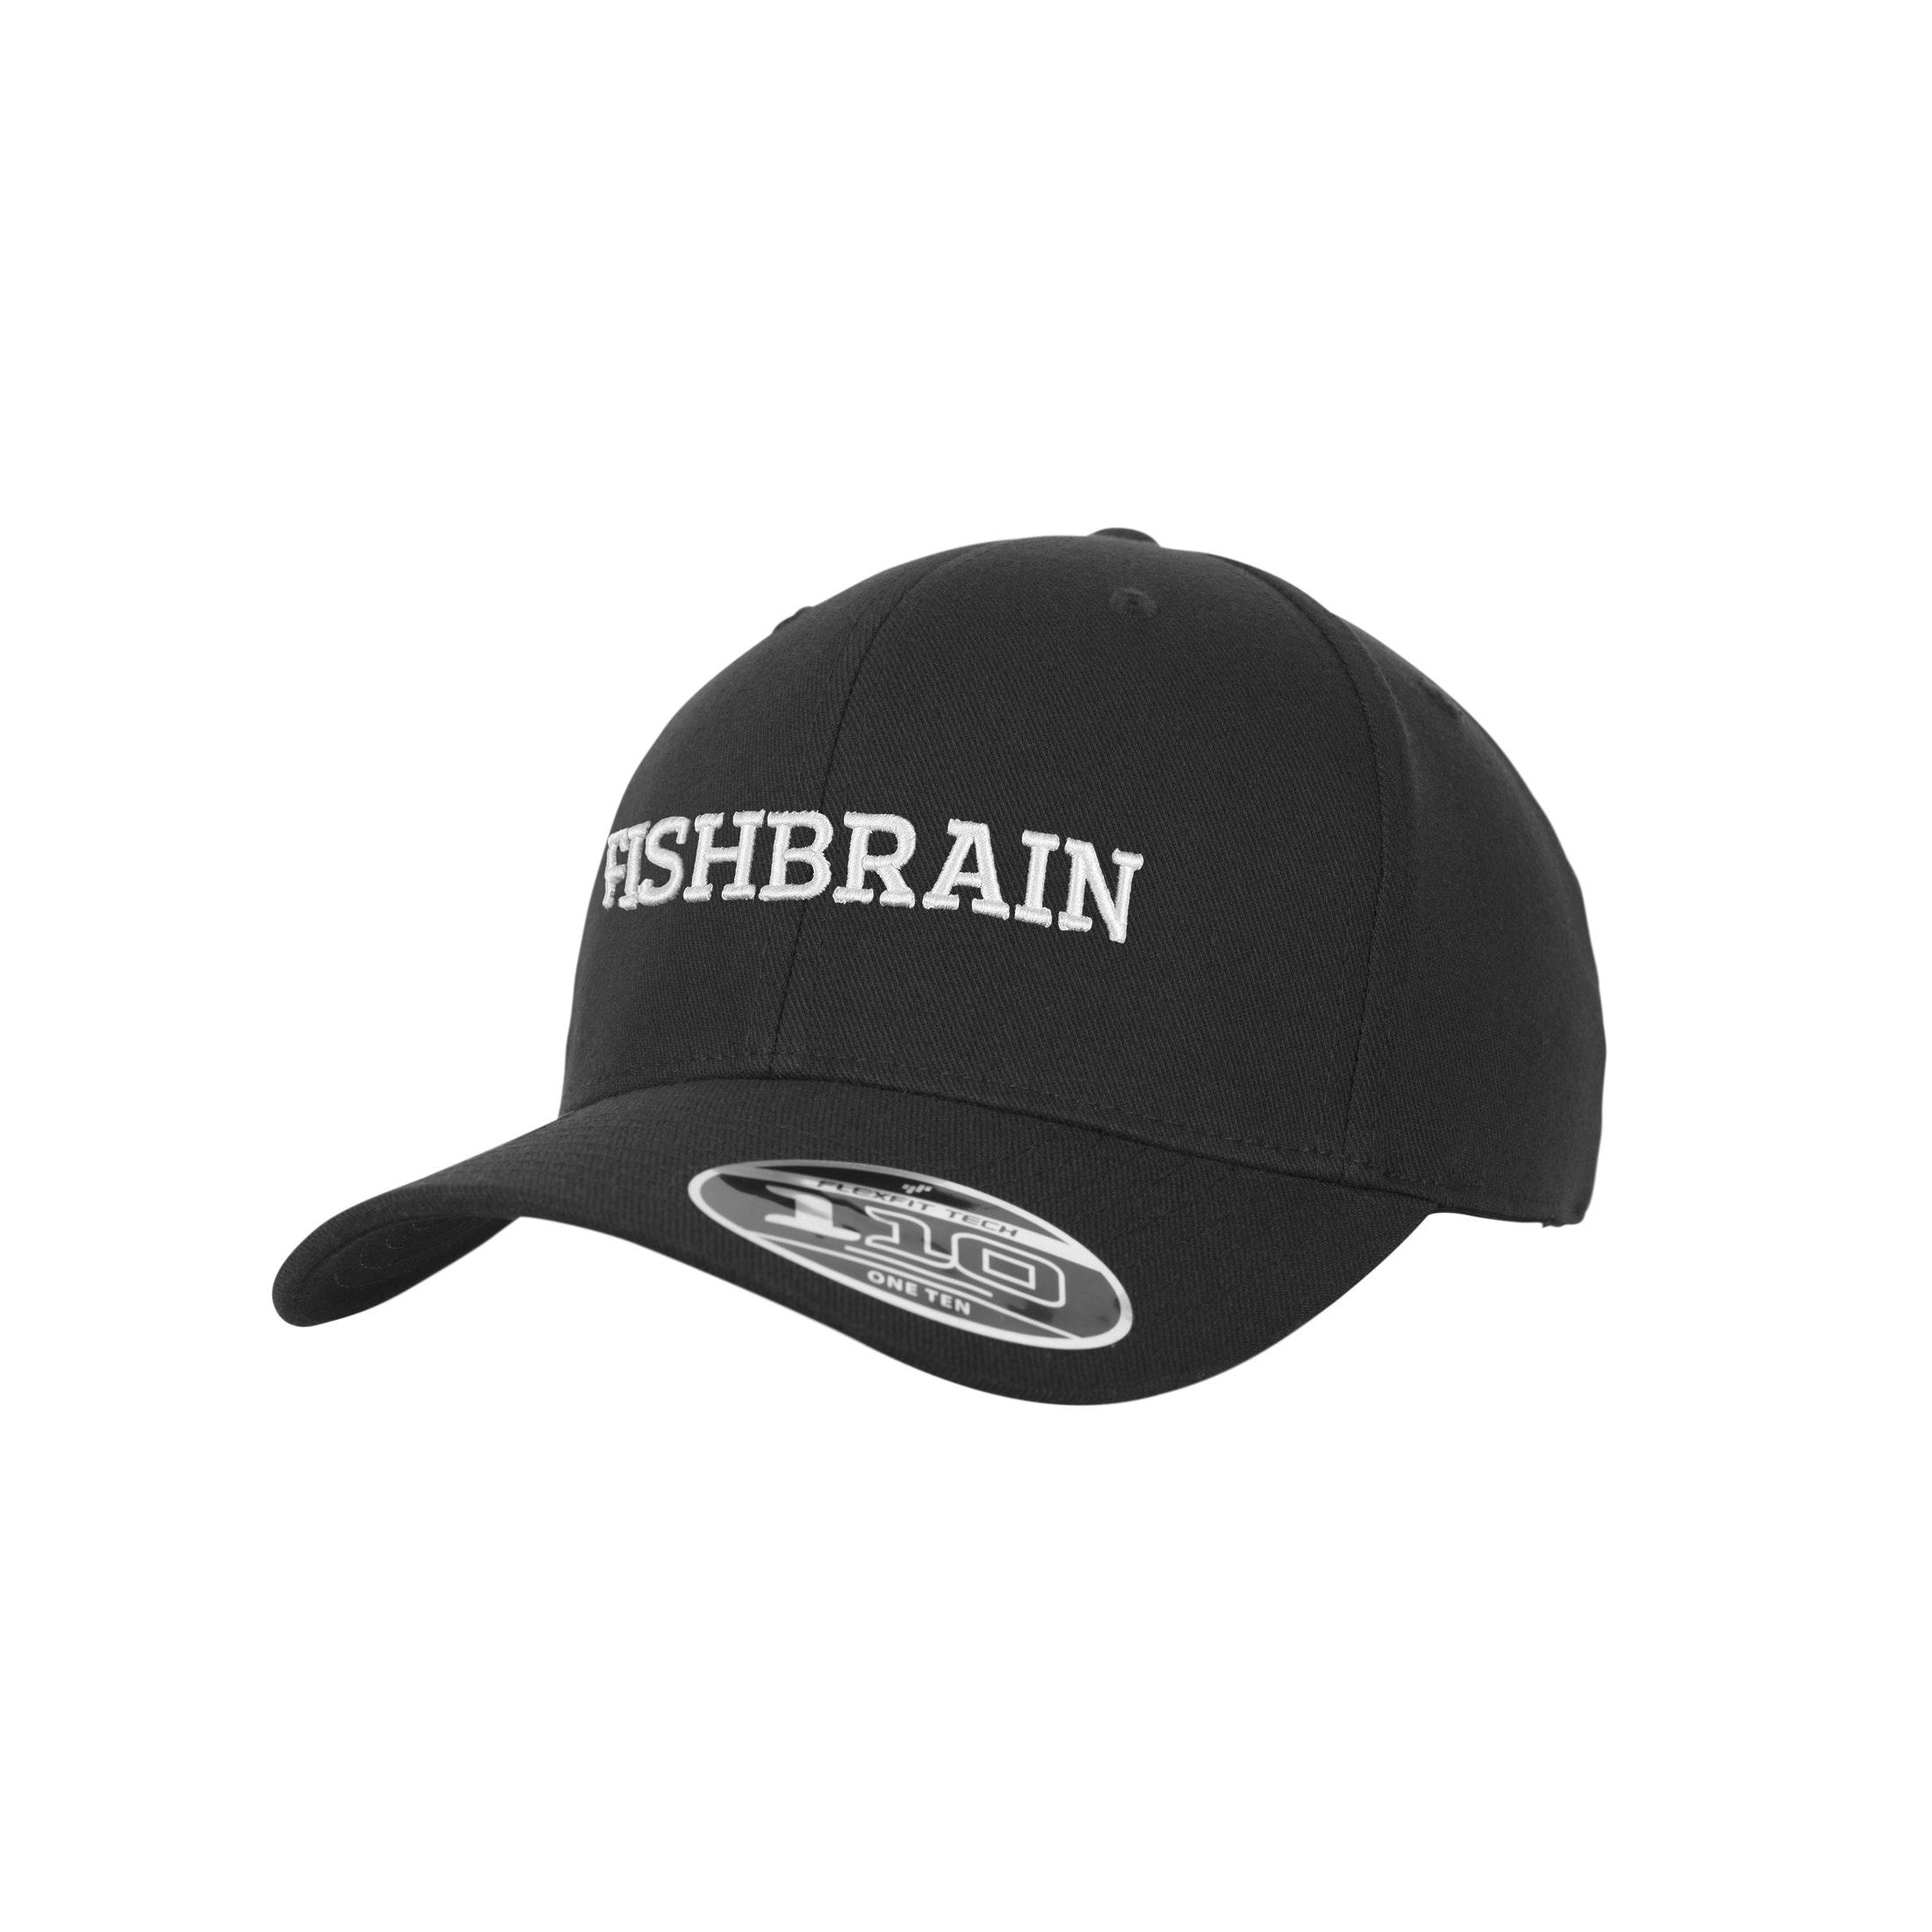 Fishbrain Jensie Hat - Black